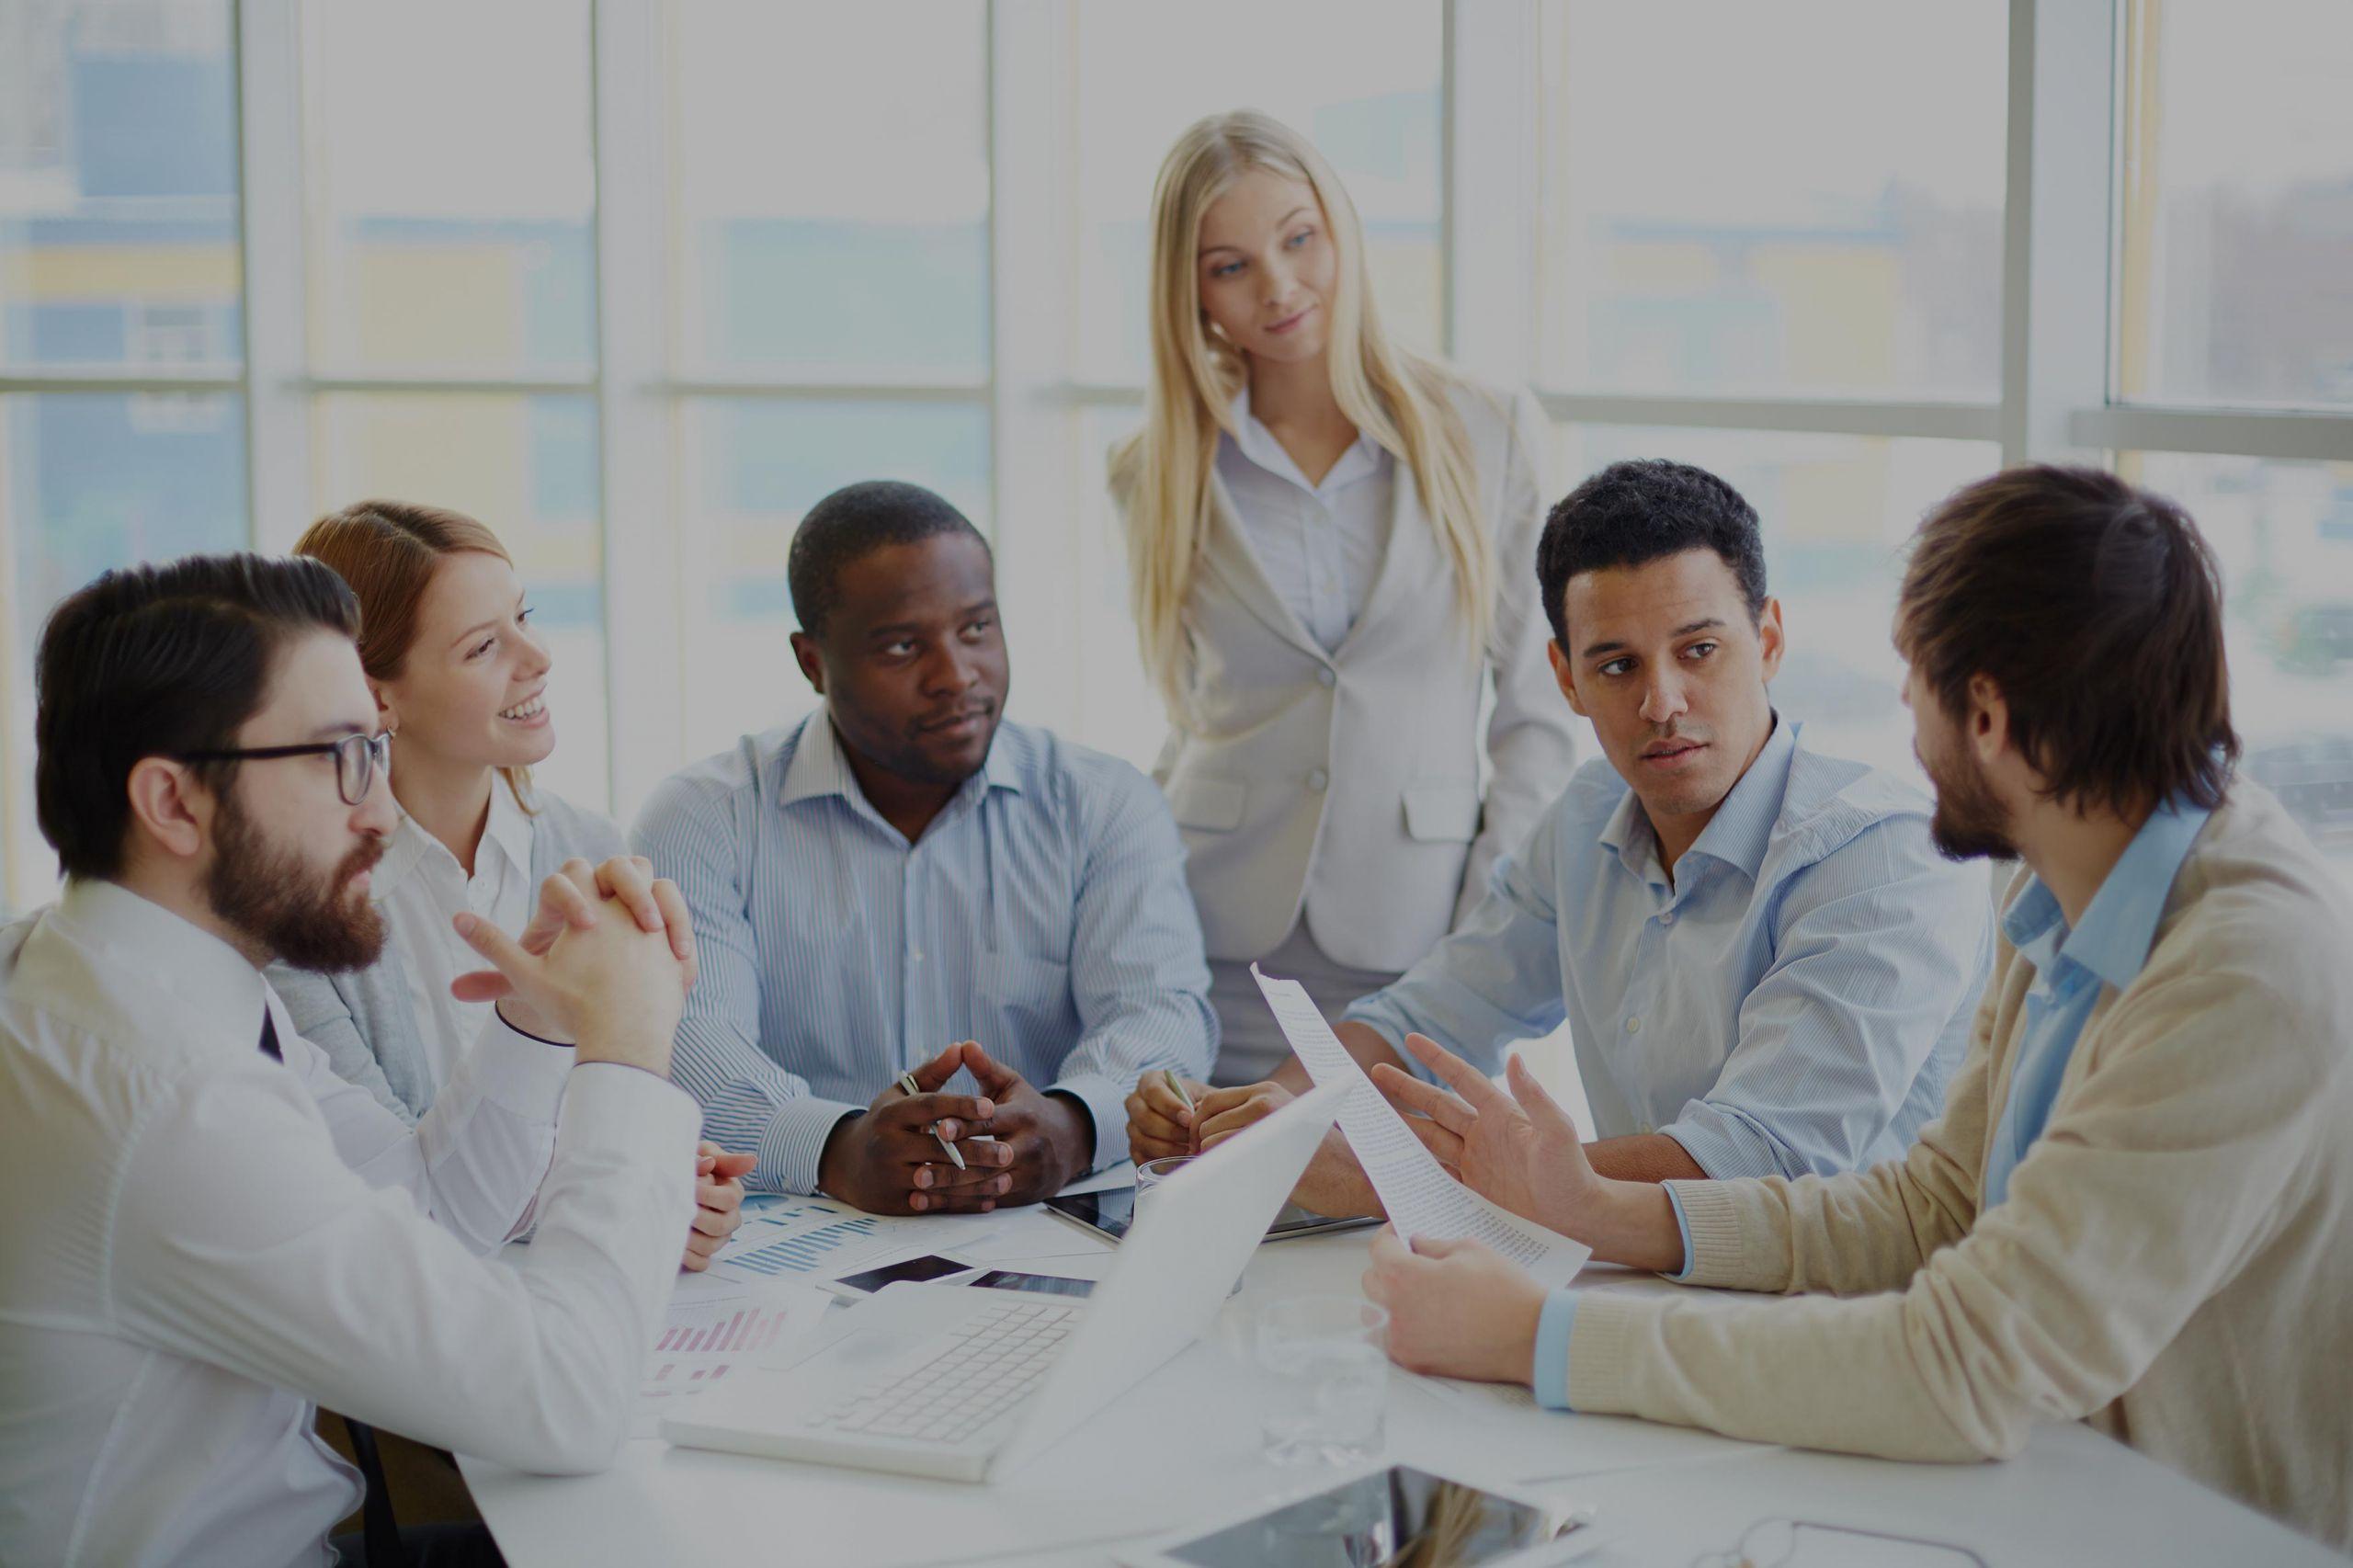 Thompson Financial Consulting, Hadleigh, Ipswich, Sudbury, Suffolk